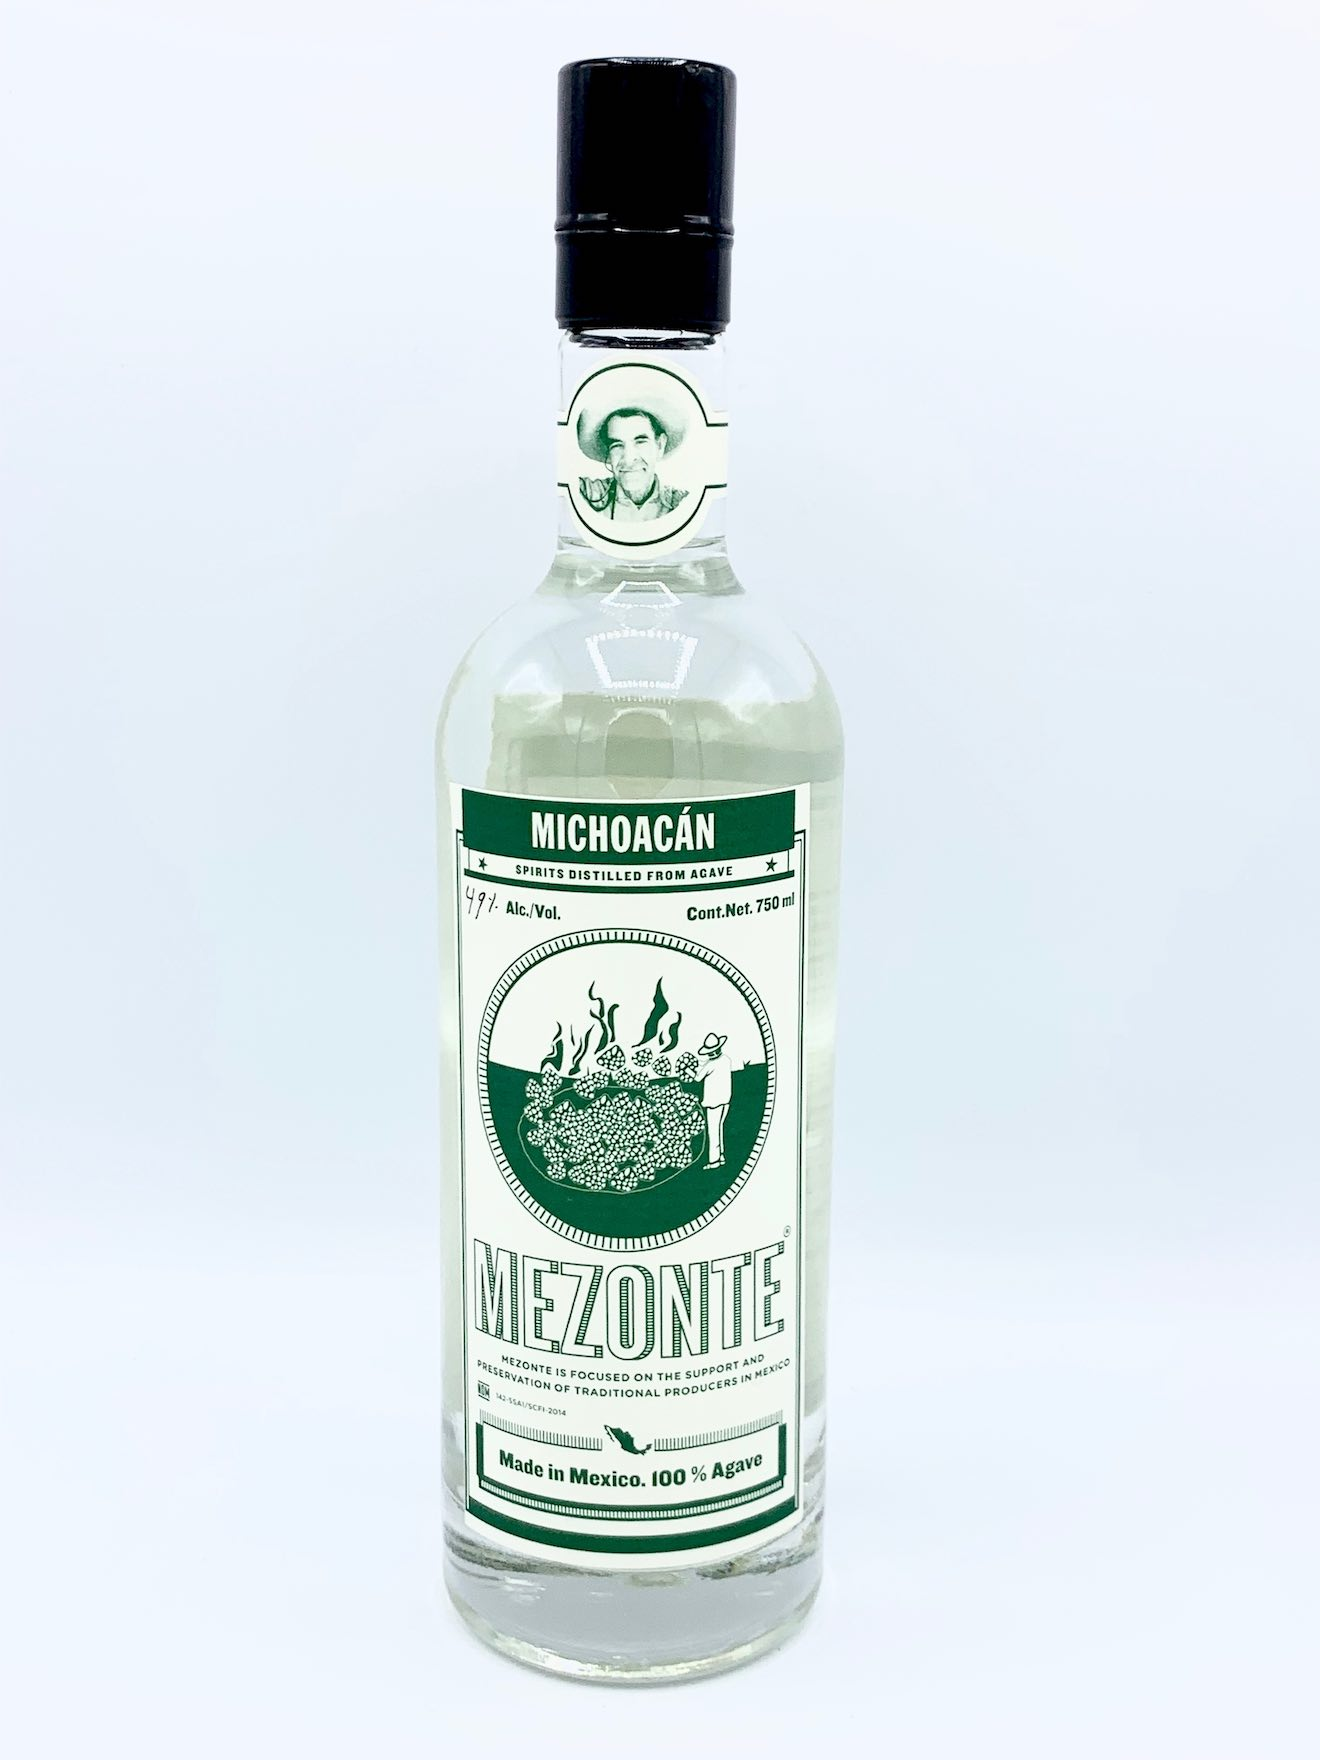 Mezonte - Jorge Perez Agave Spirit (Querendaro, Mexico)